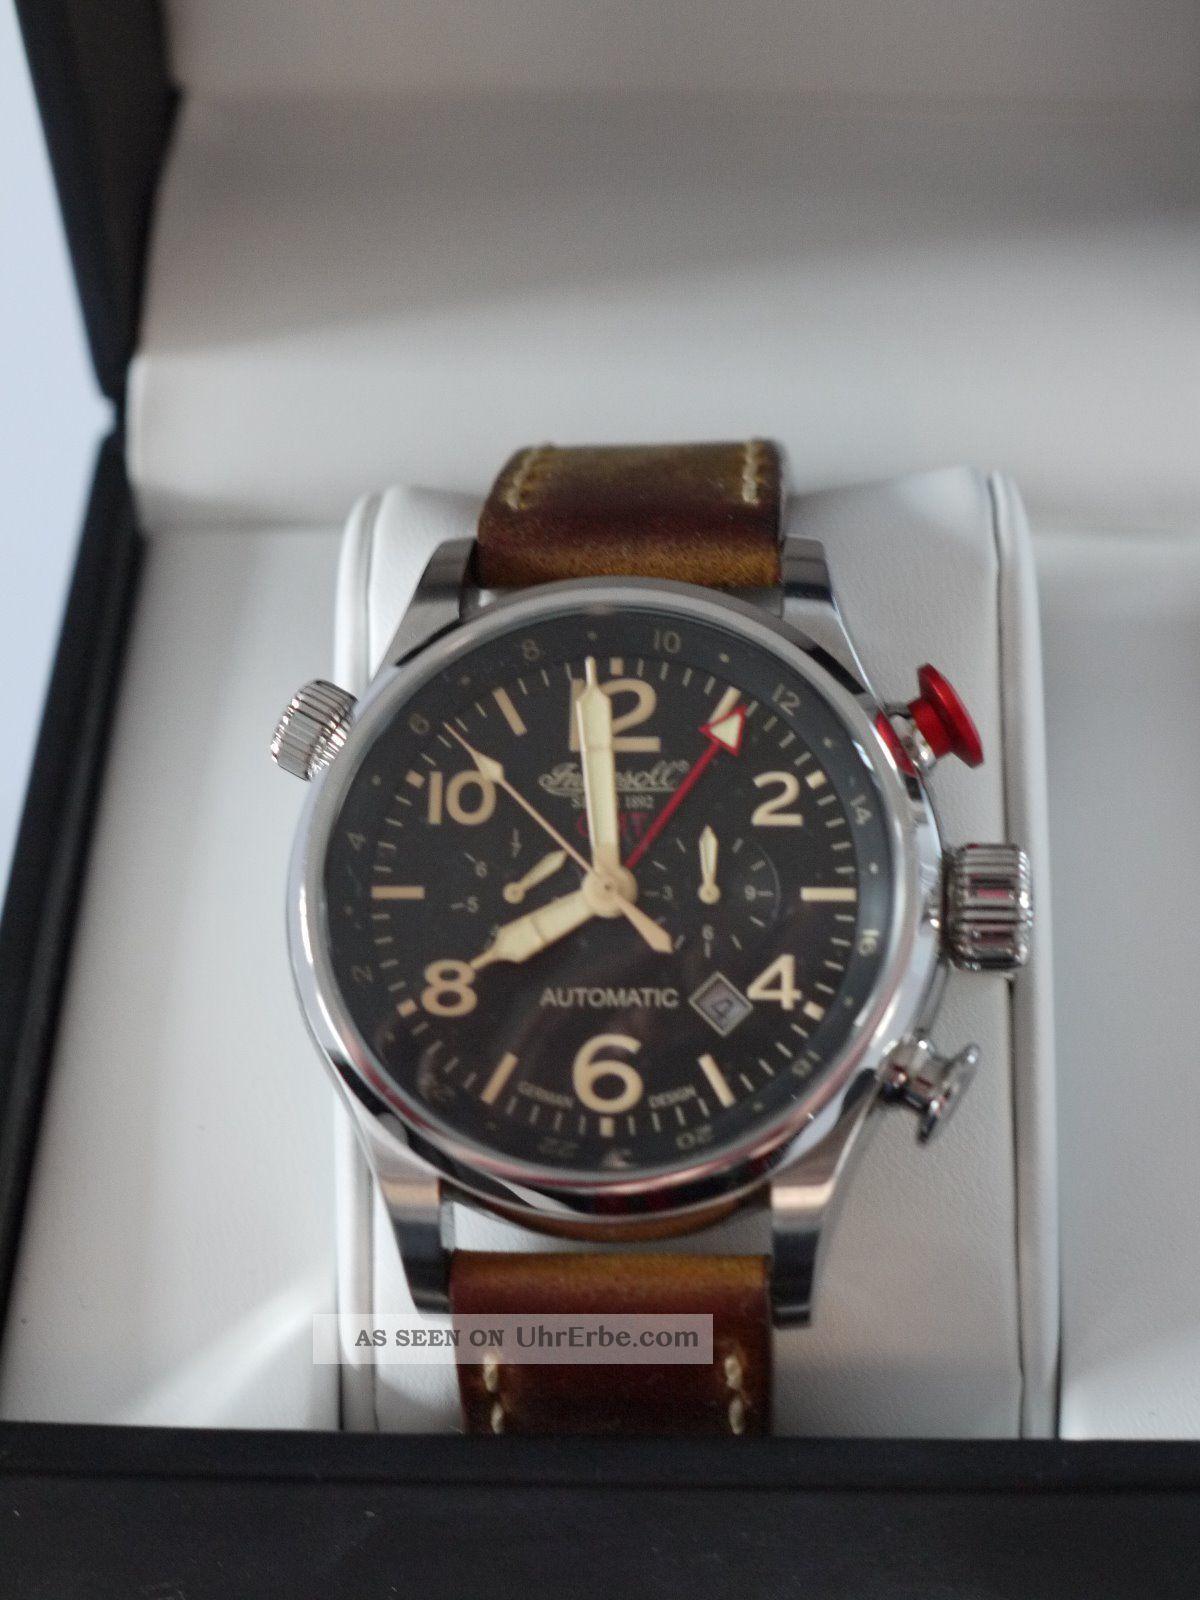 Ingersoll Lawrence Gmt Herren Automatikuhr In3218bk Limited Edition Armbanduhren Bild